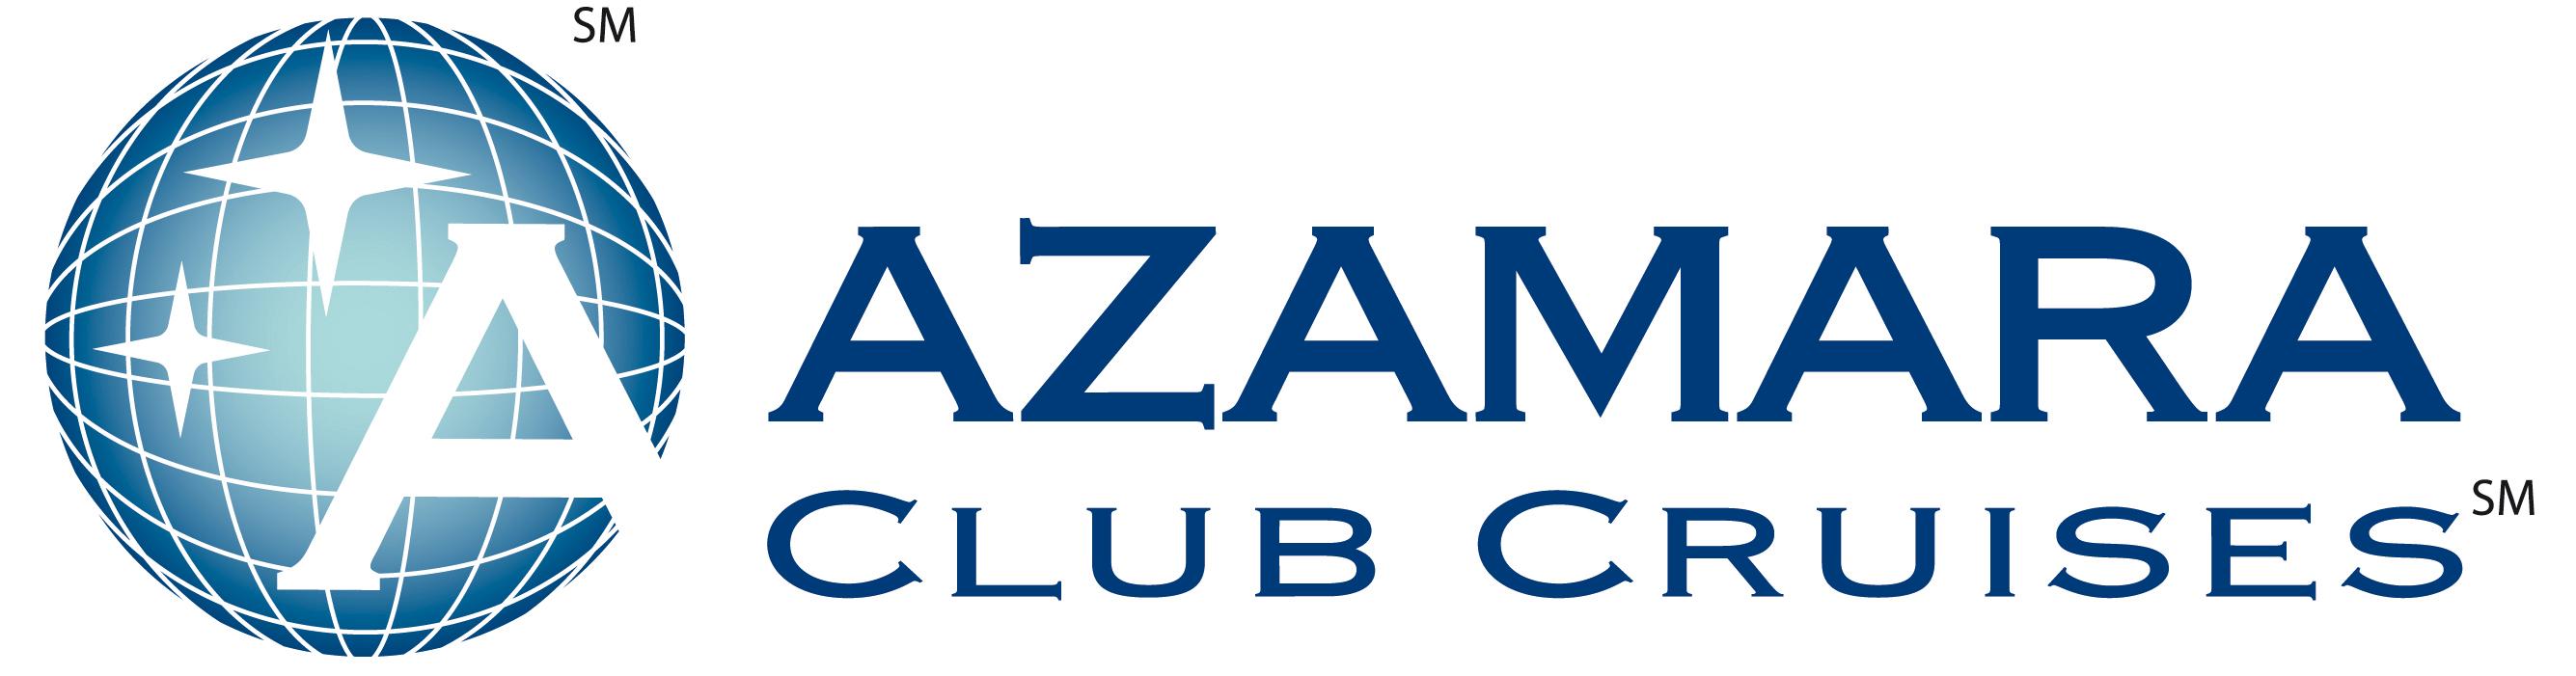 Azamara Club Croisière